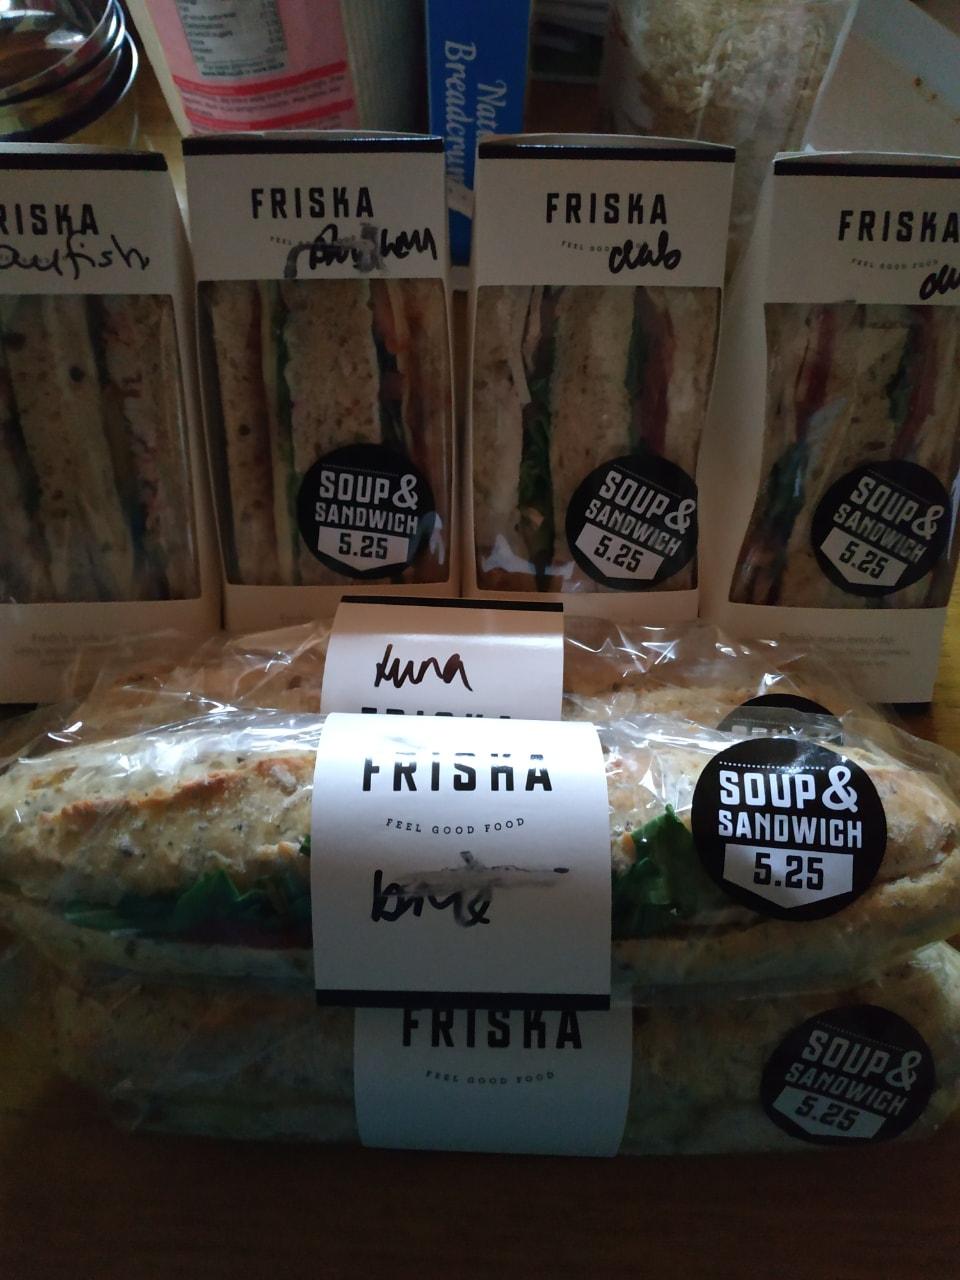 Friska - sandwiches and baguettes